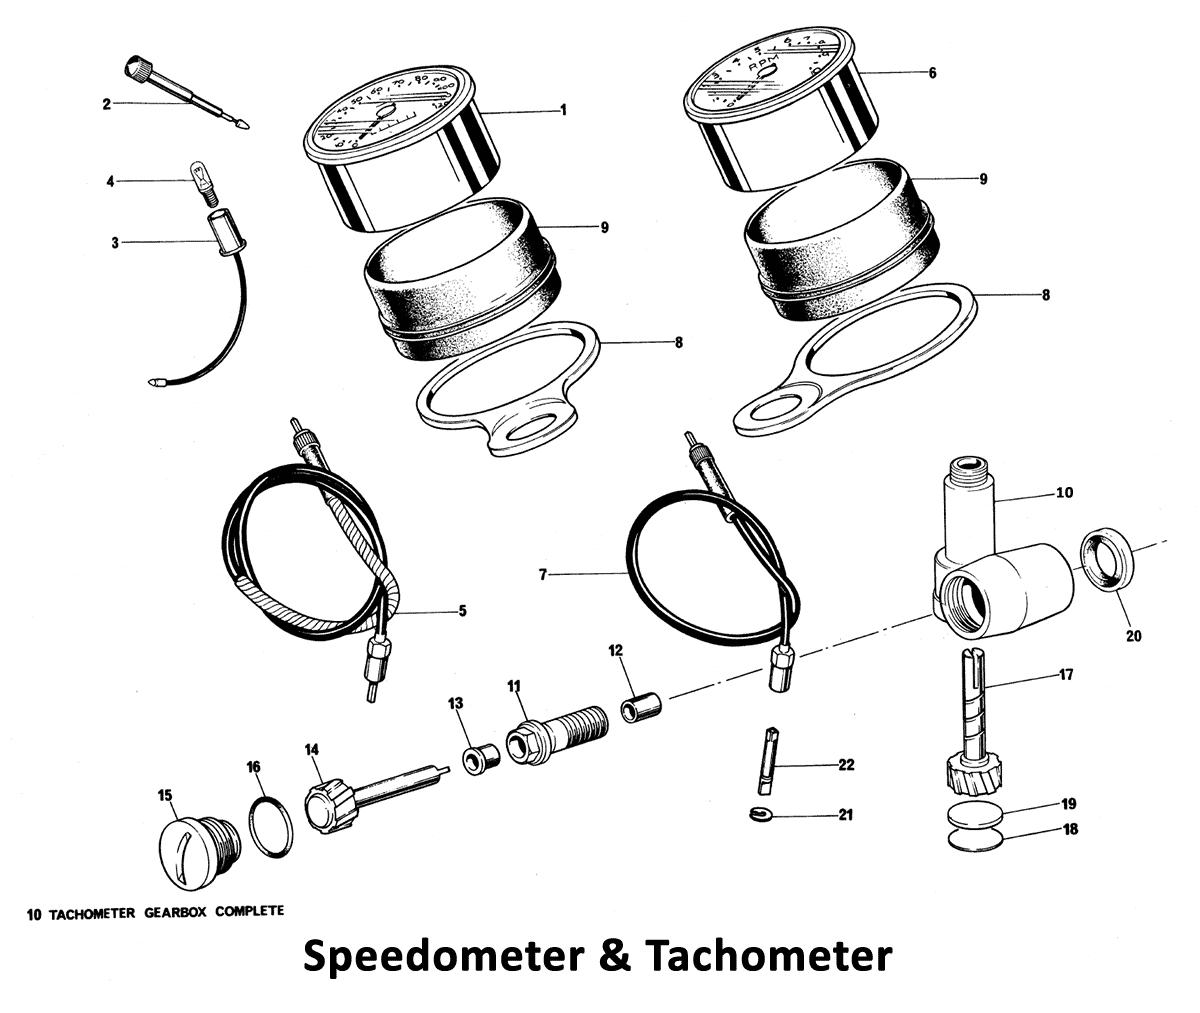 1973 Triumph 750 Speedometer & Tachometer - Classic Bike Spares